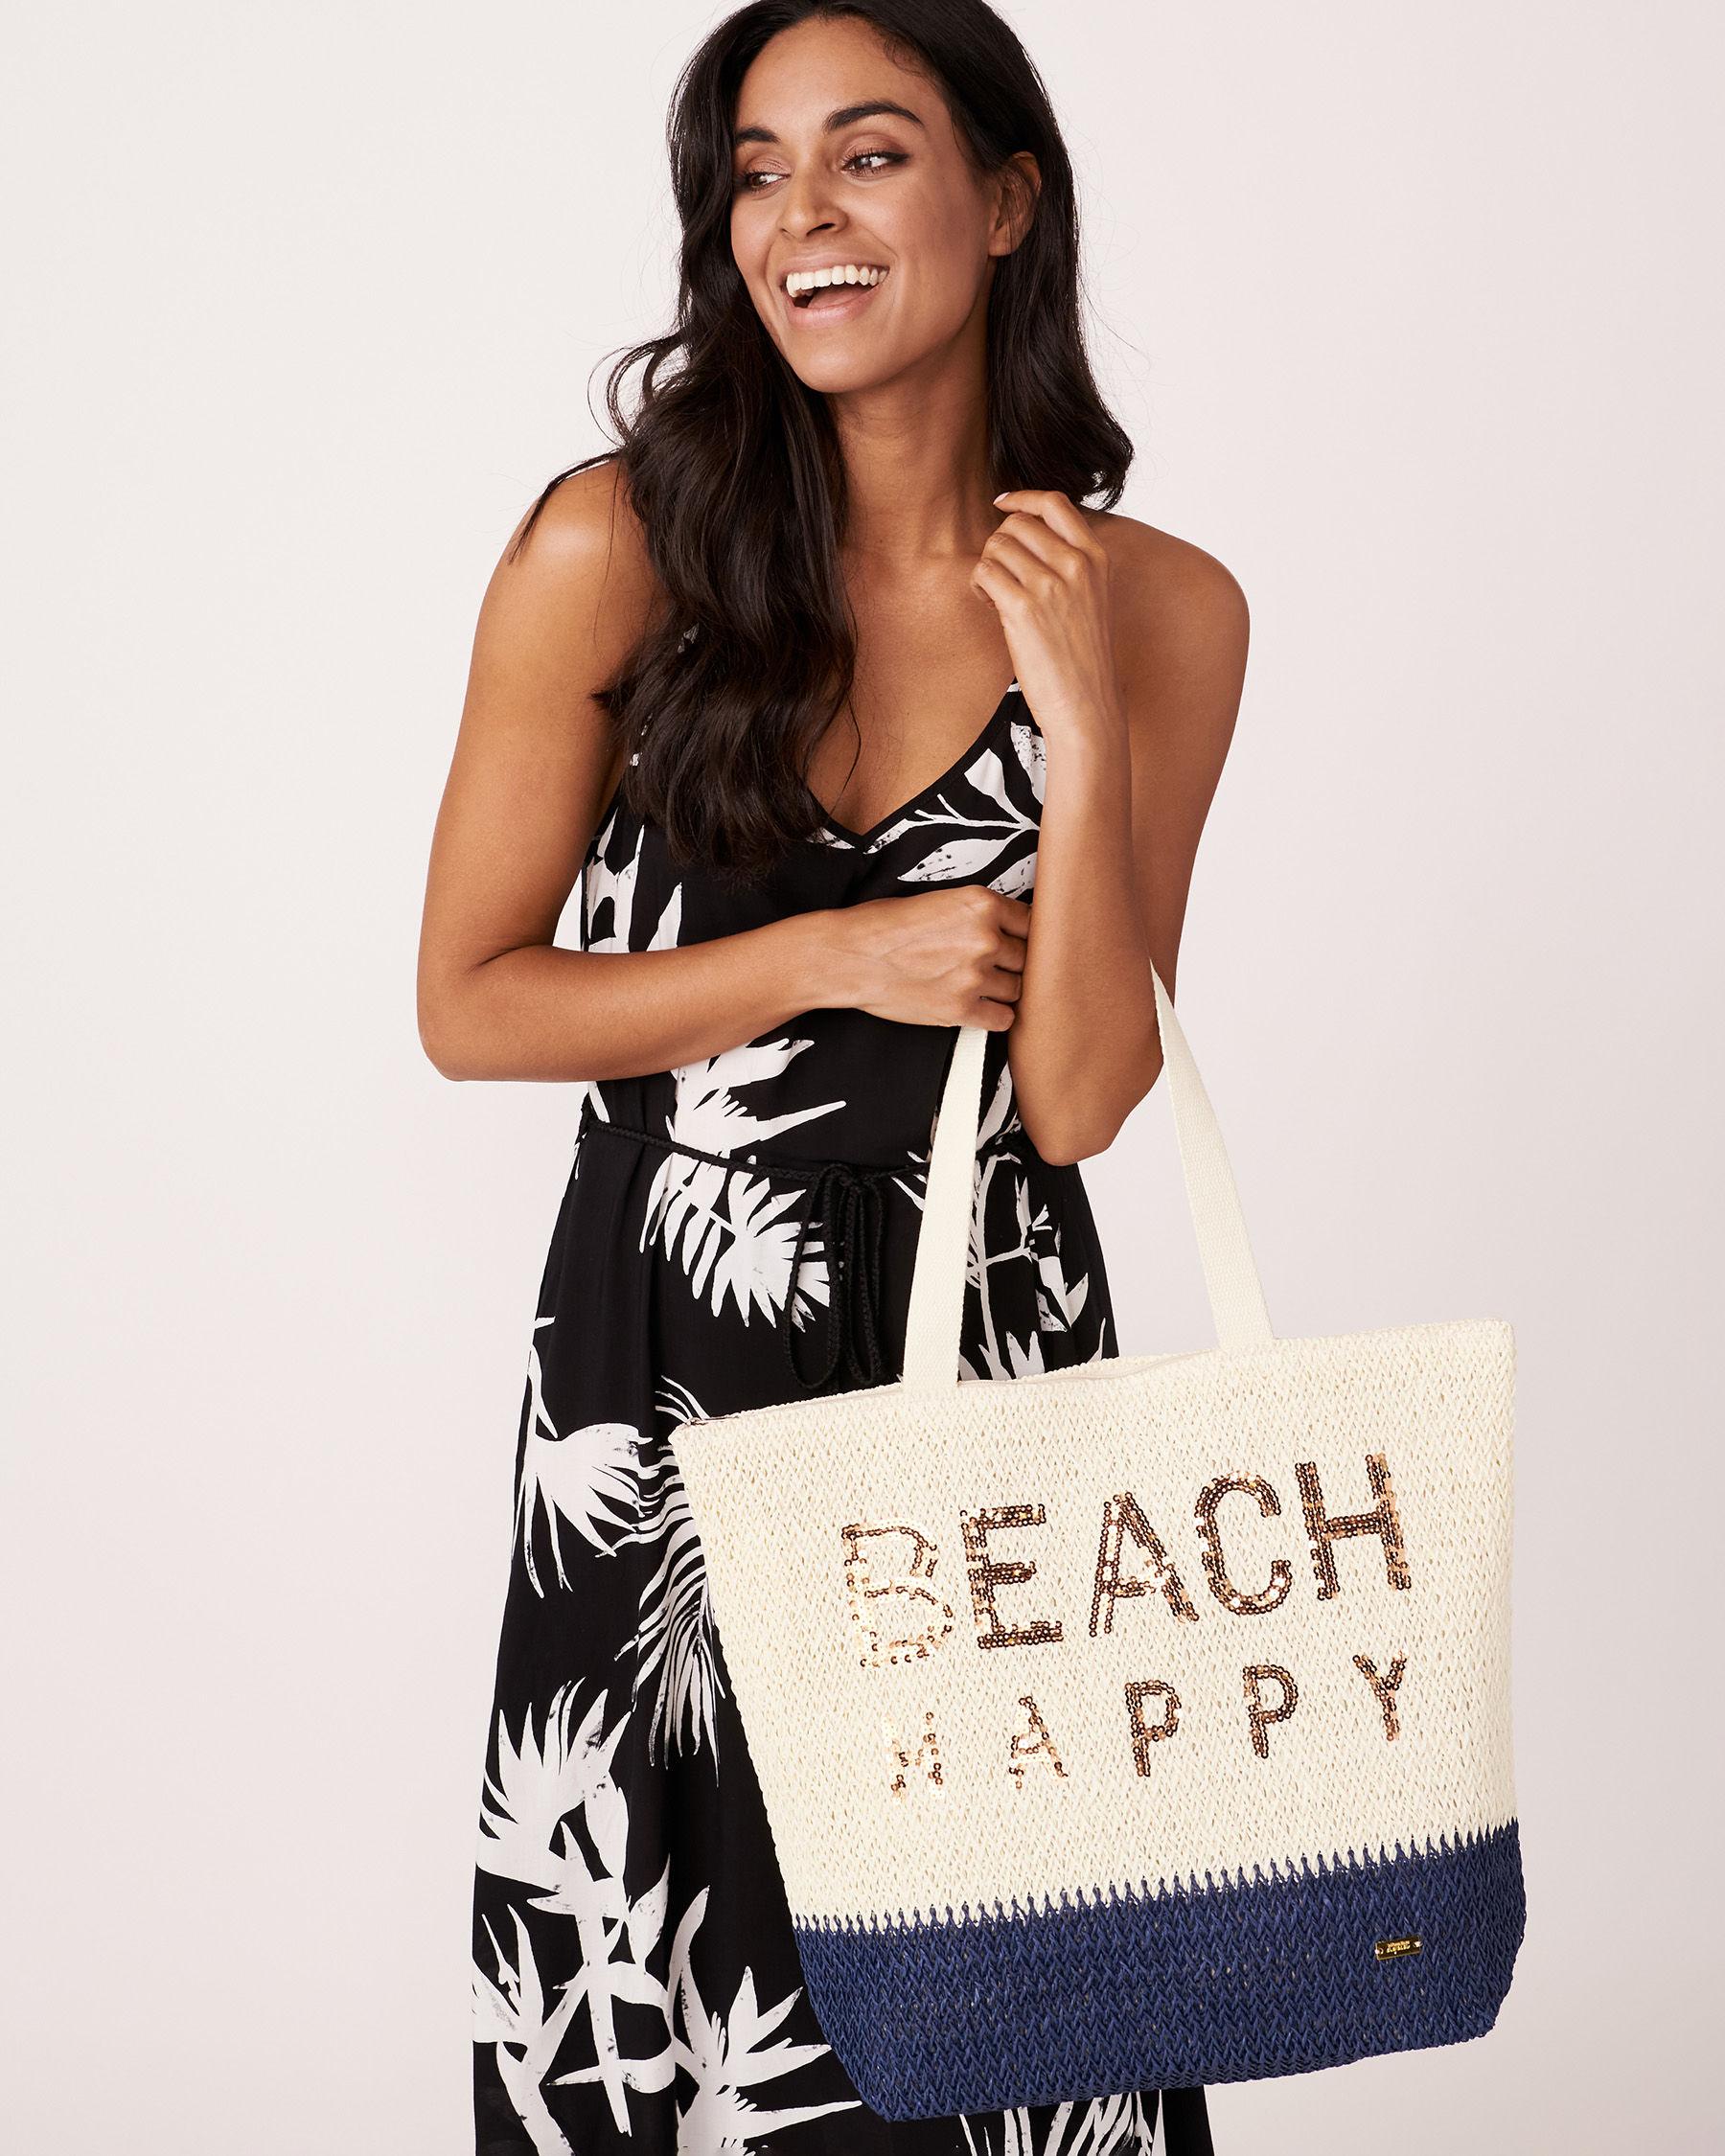 LA VIE EN ROSE AQUA BEACH HAPPY Bag Beige 635-661-0-11 - View1